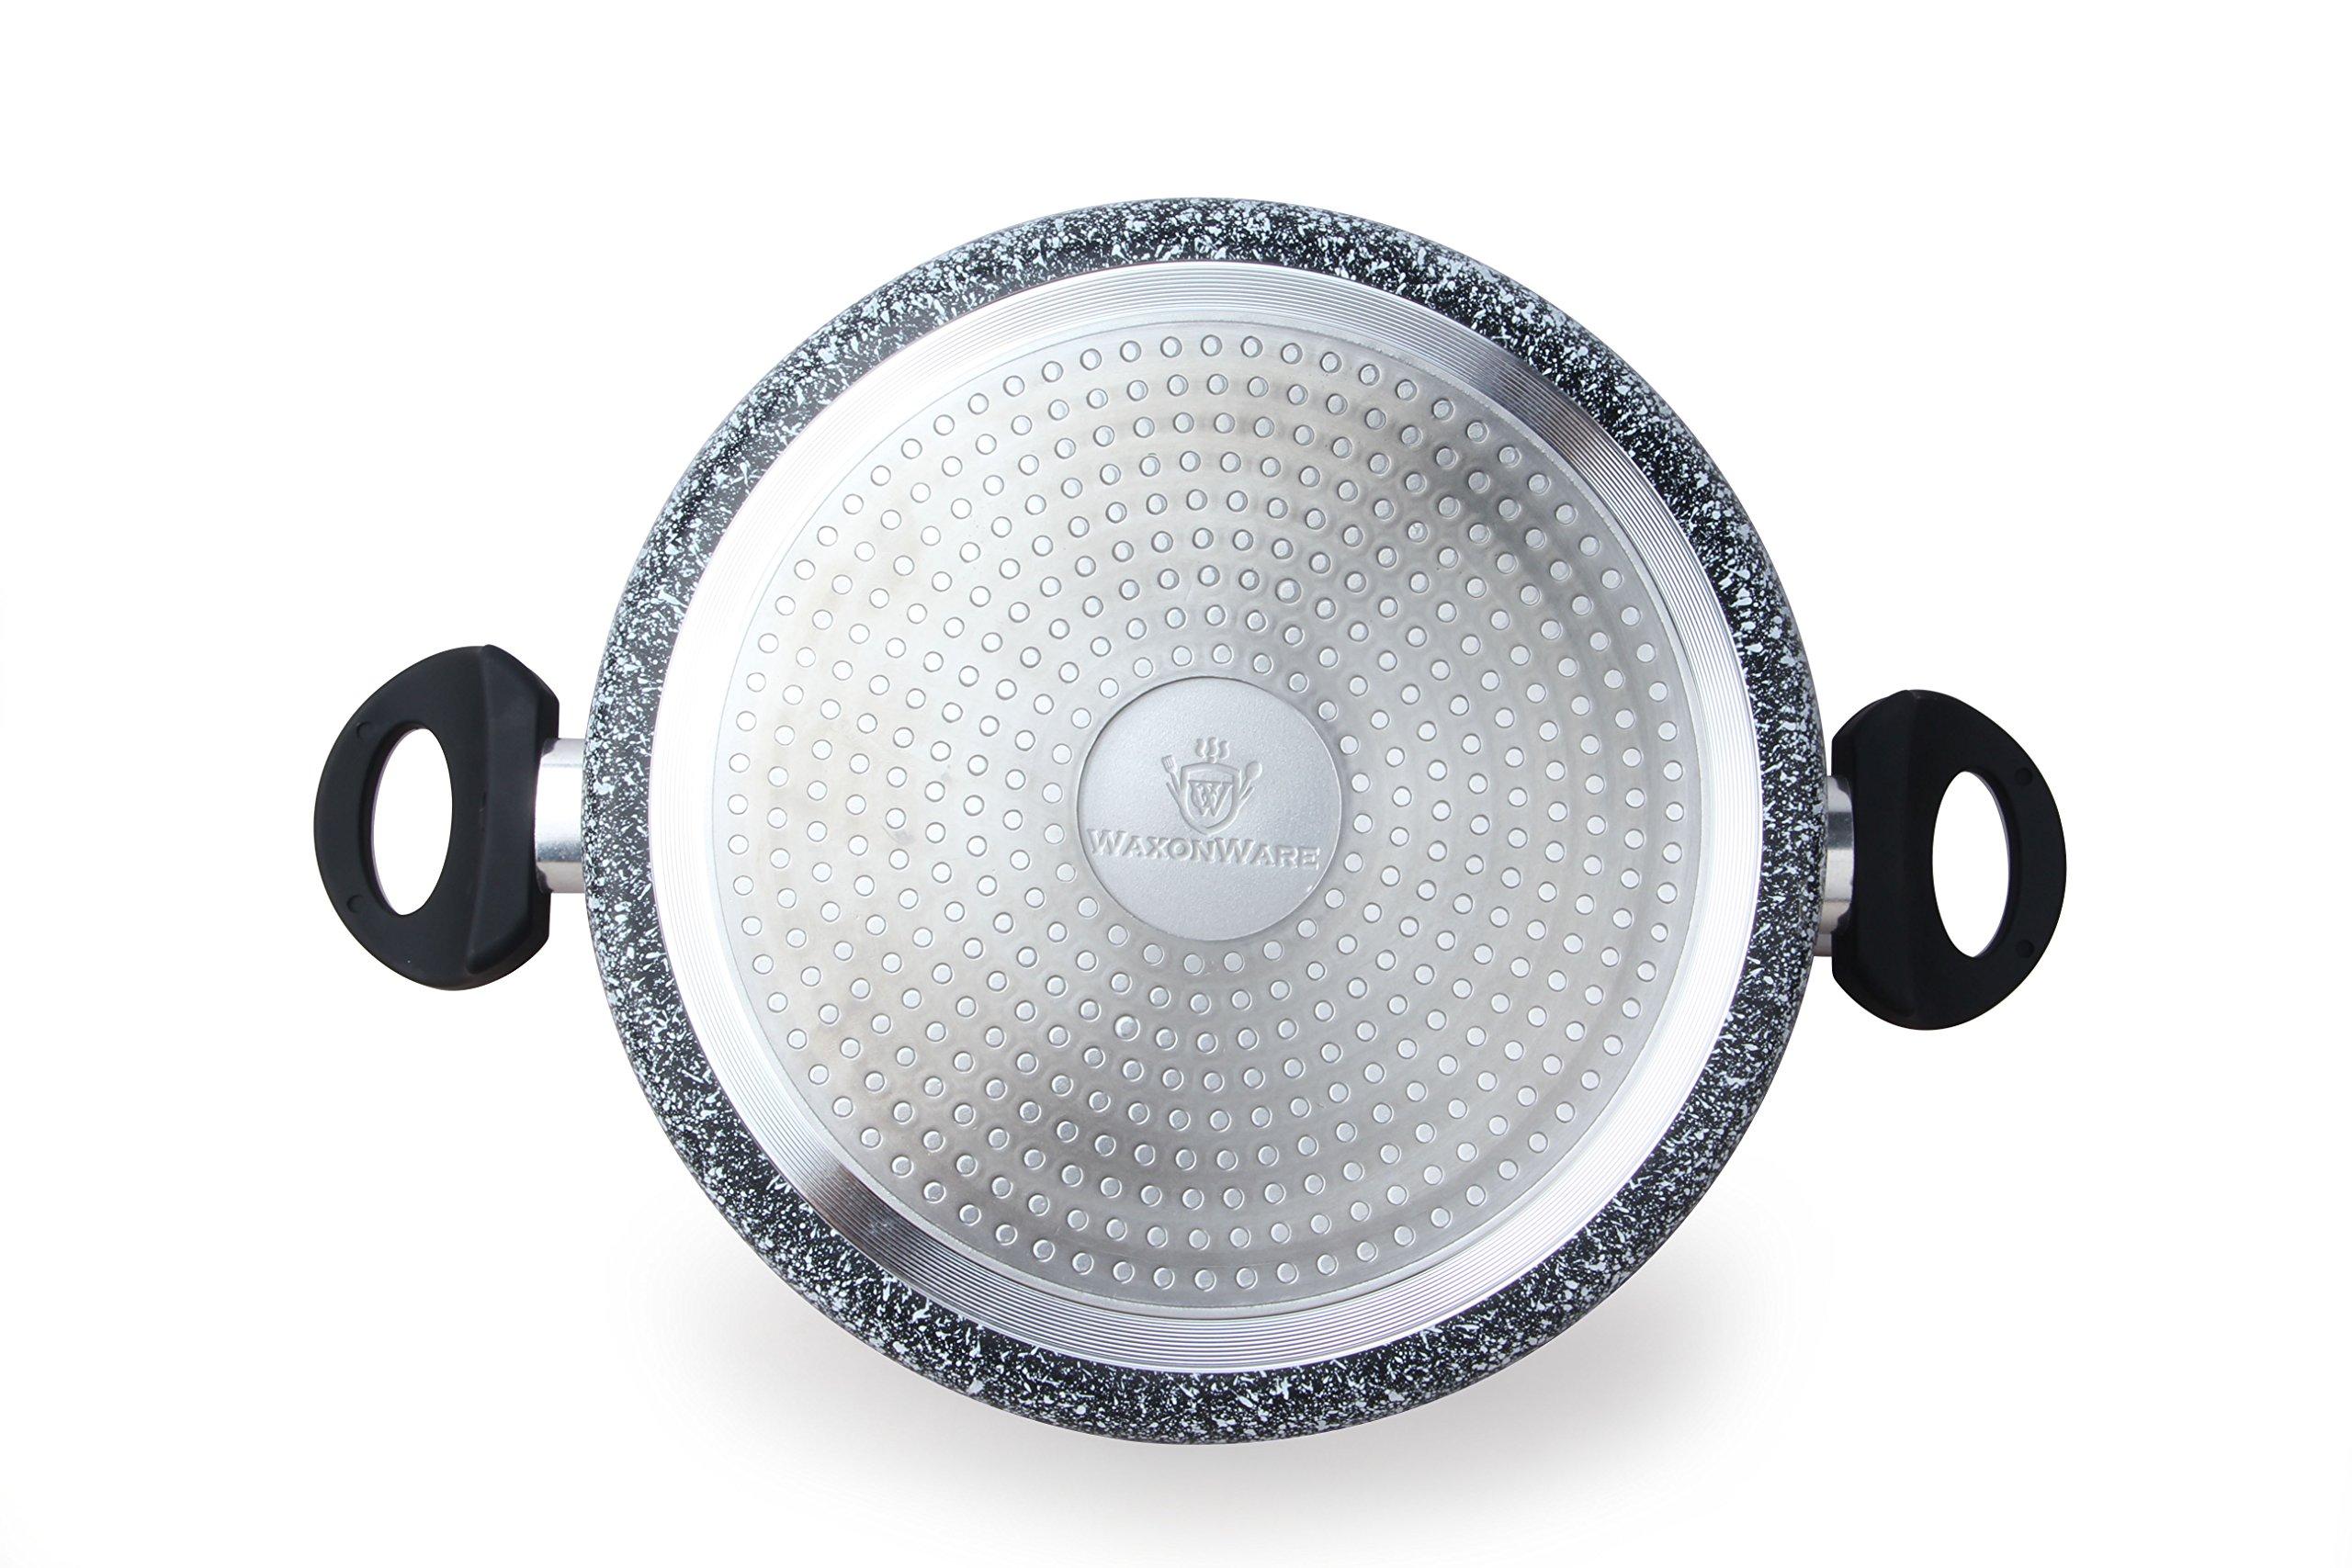 WaxonWare 5.25 Quart Ceramic Nonstick Dutch Oven Casserole Stockpot, Anti-Warp Non Toxic PTFE APEO PFOA Free Nonstick Pot With Lid, Induction Compatible, Dishwasher Safe Dutch Oven (STONETEC Series) by WaxonWare (Image #4)